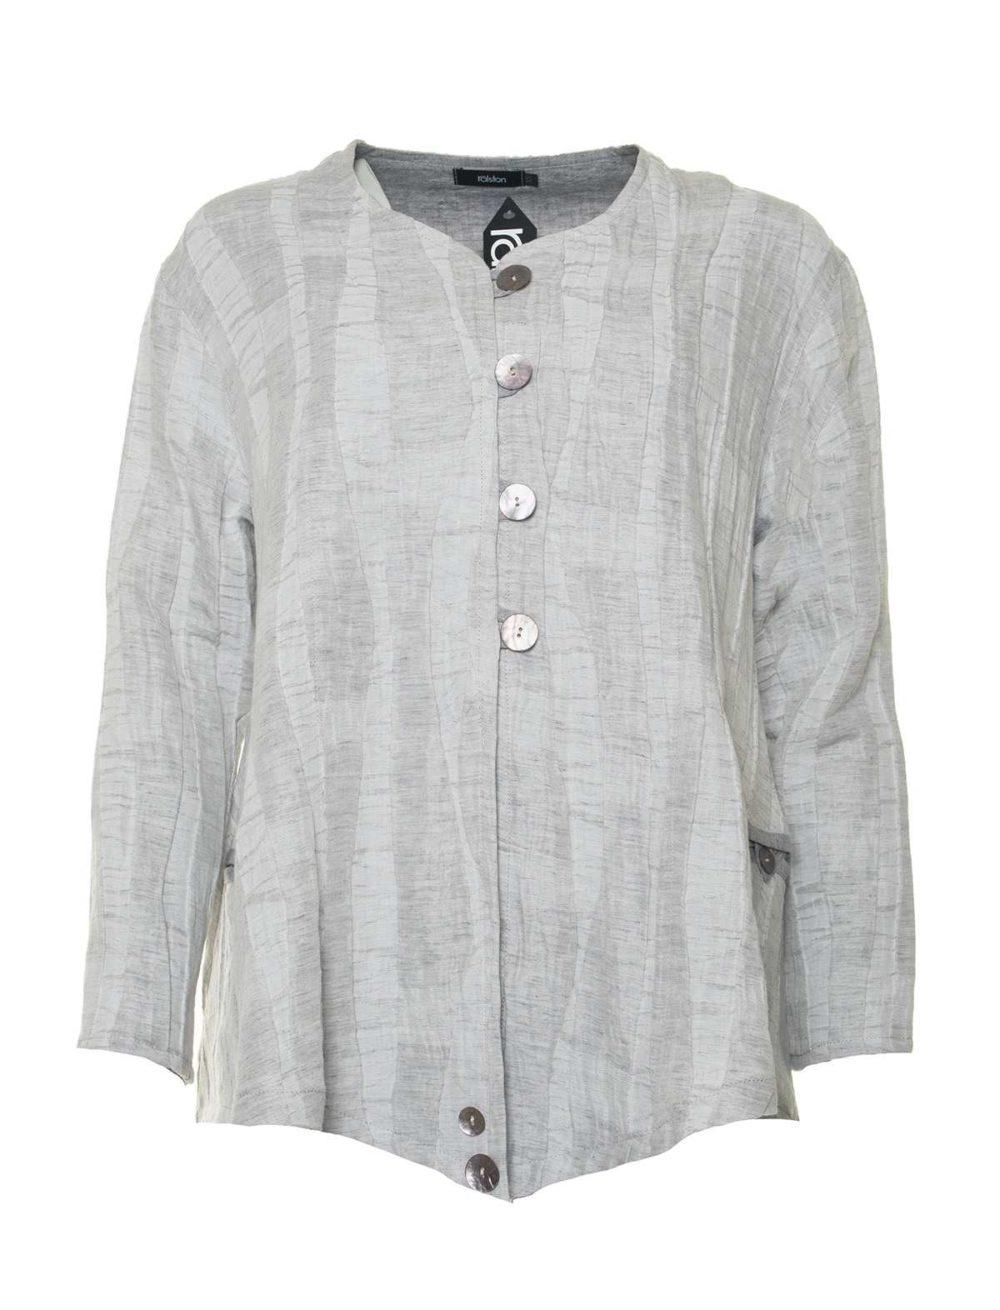 Tamo Jacket Ralston Katie Kerr Women's Clothing